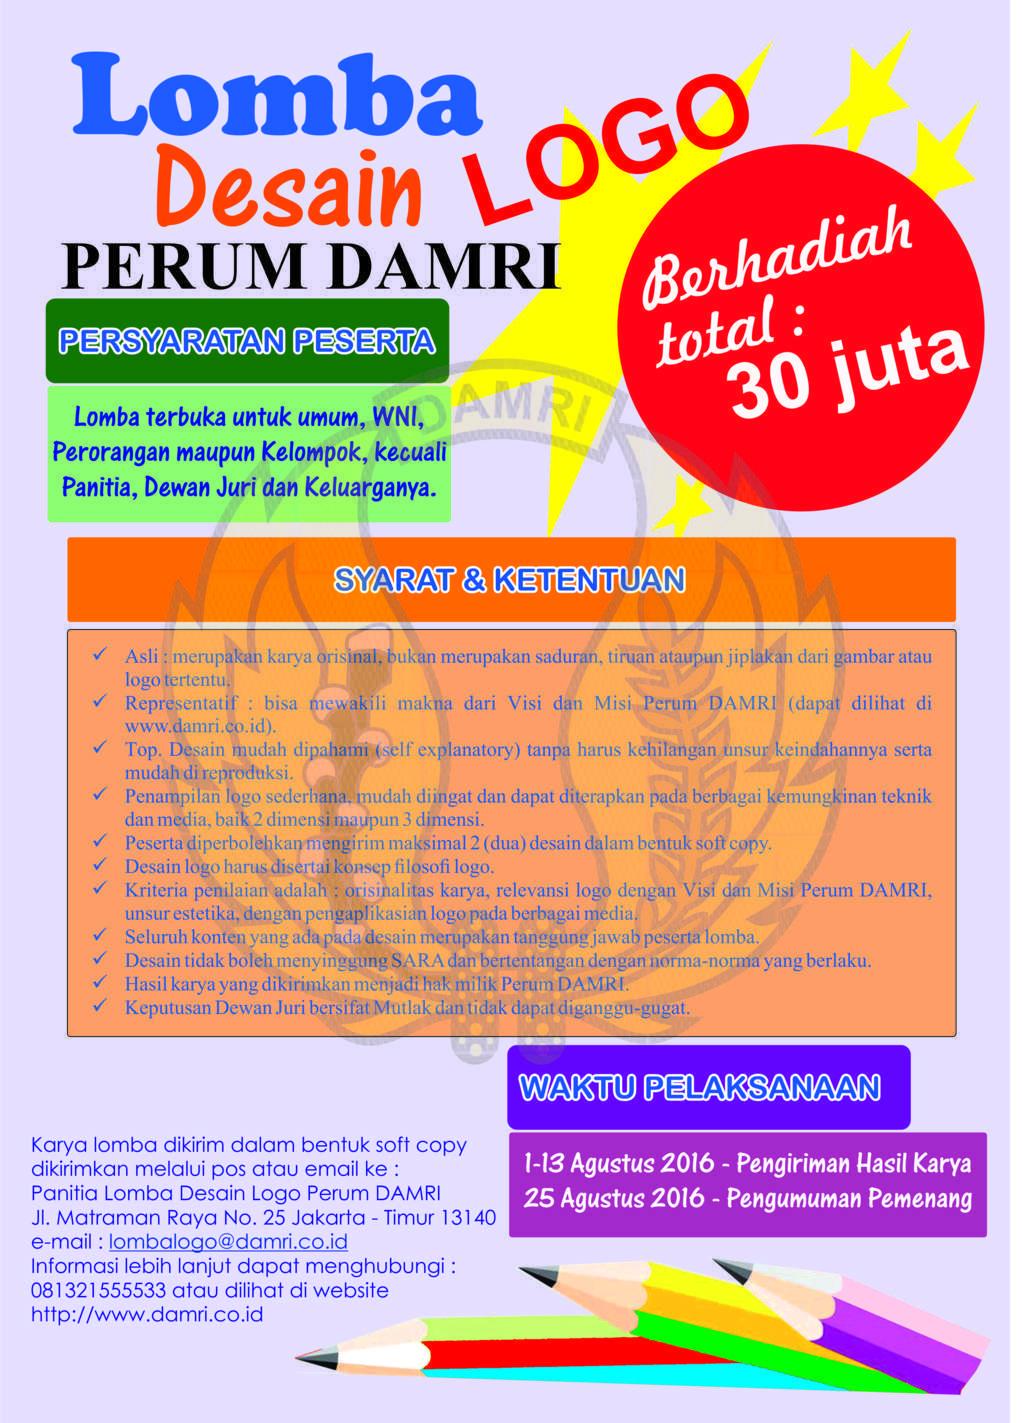 Lomba Desain Logo DAMRI Total Hadiah 30 Juta